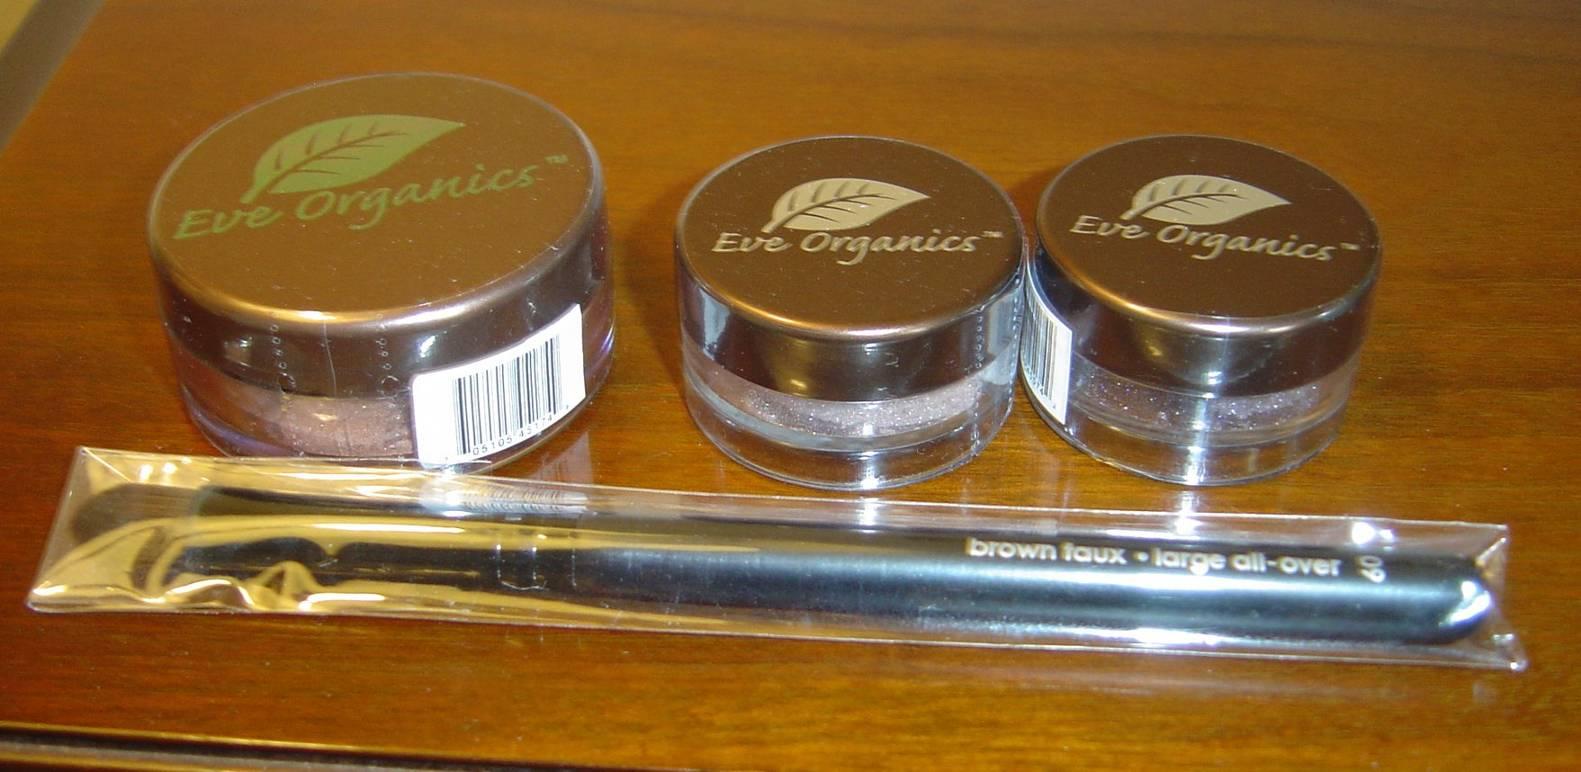 Eve-Organics Beauty mineral makeup